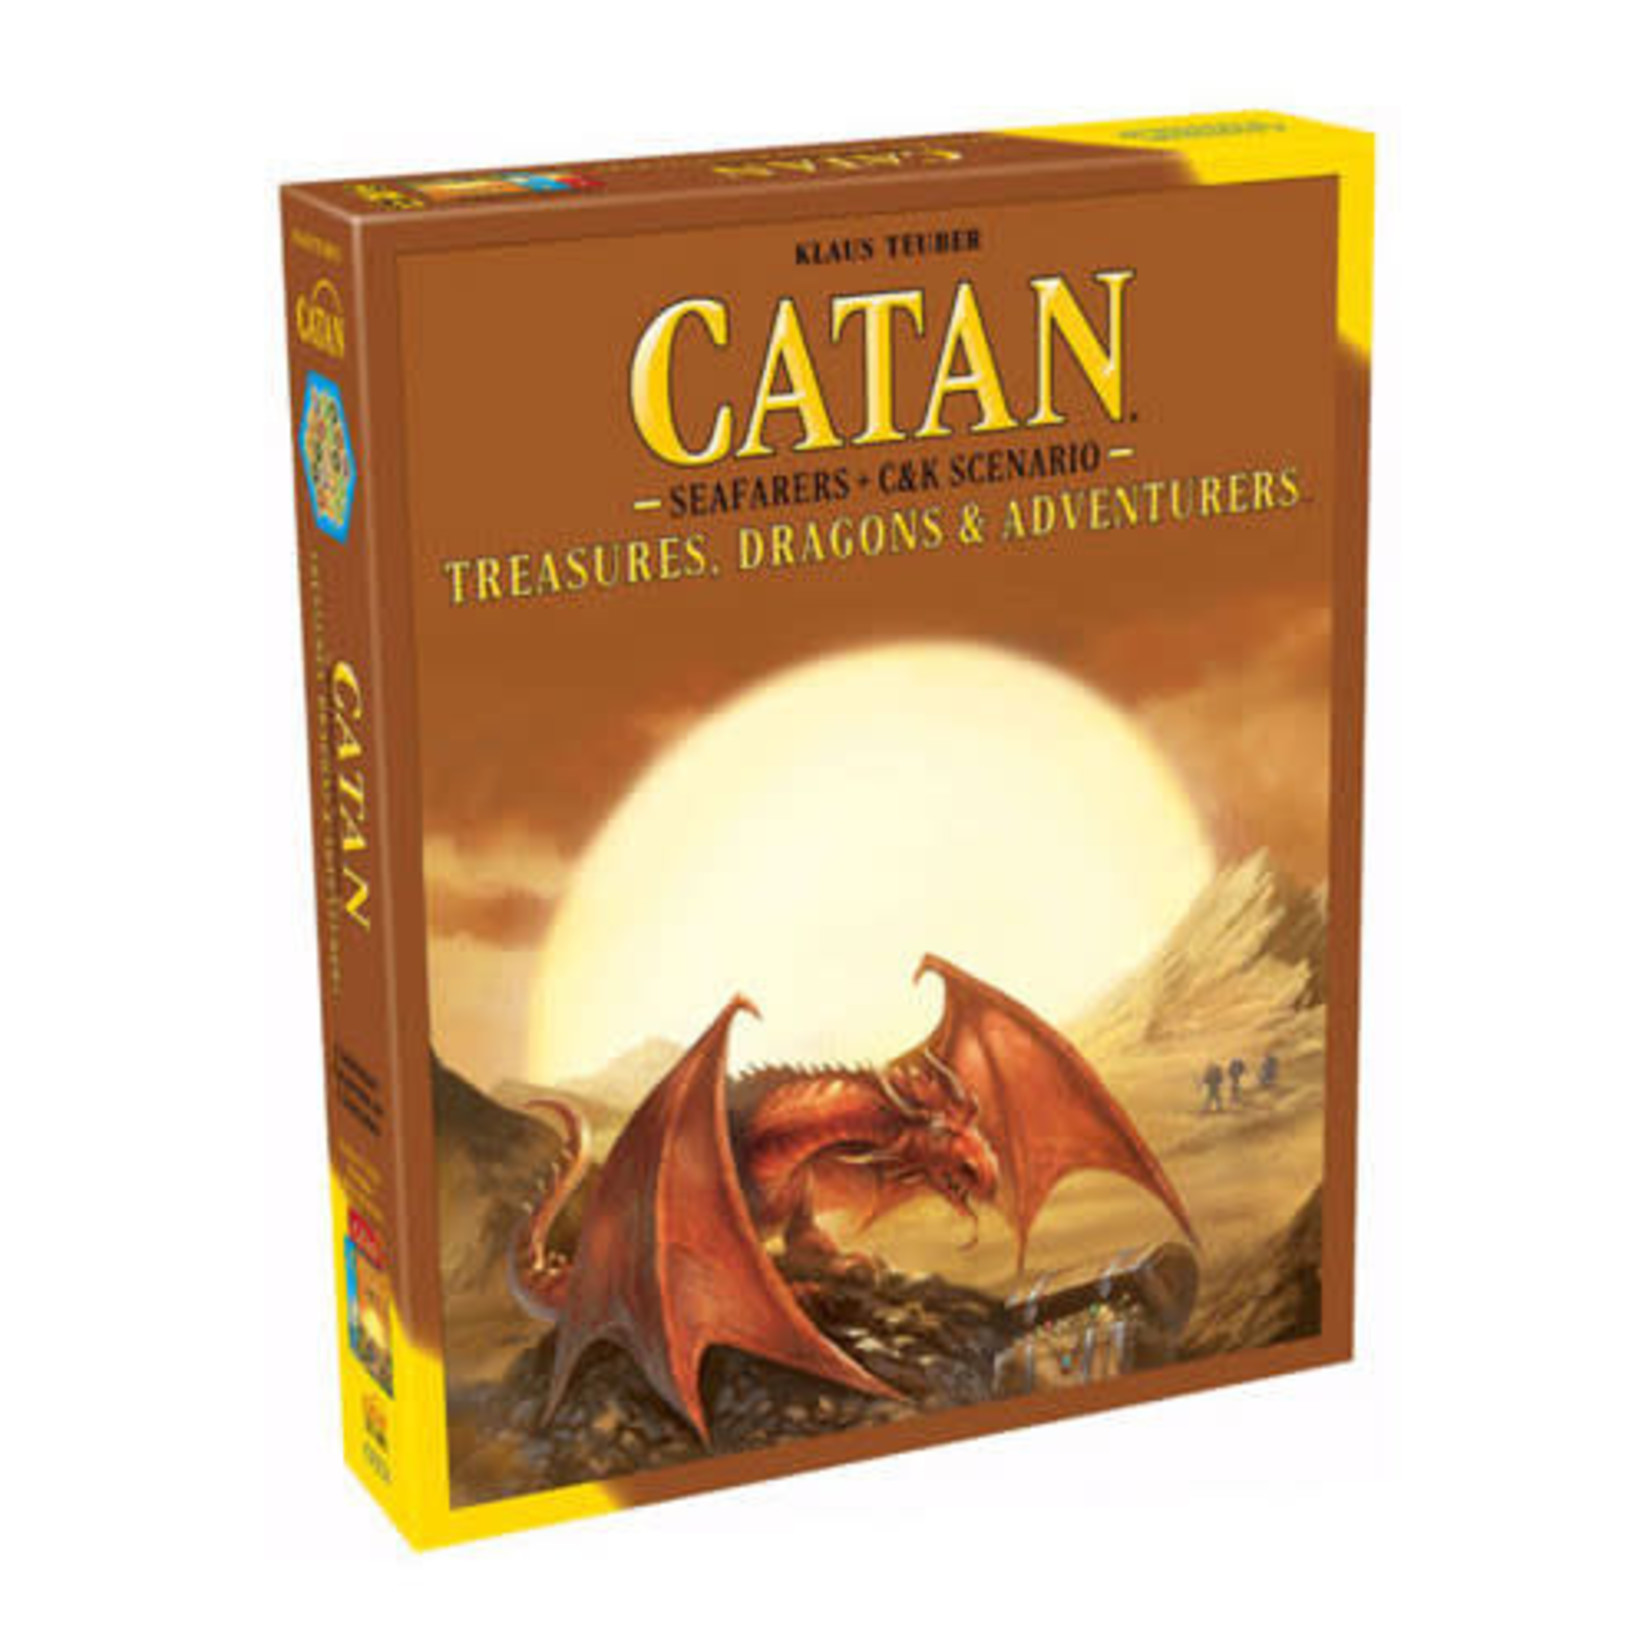 Catan Treasures Dragons and Adventurers Board Game